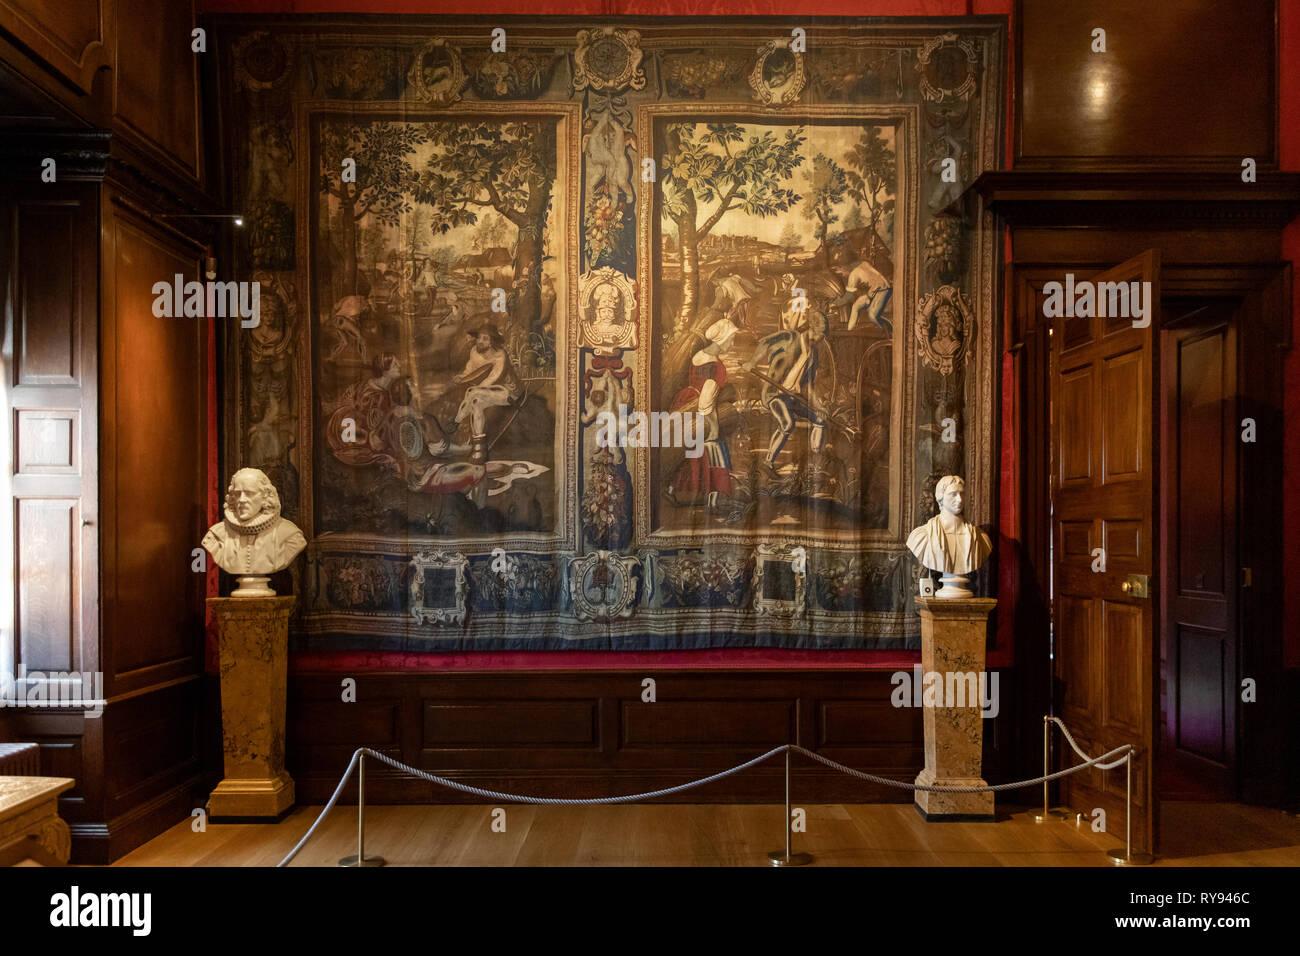 The Privy Chamber, Kensington Palace, London, Uk - Stock Image